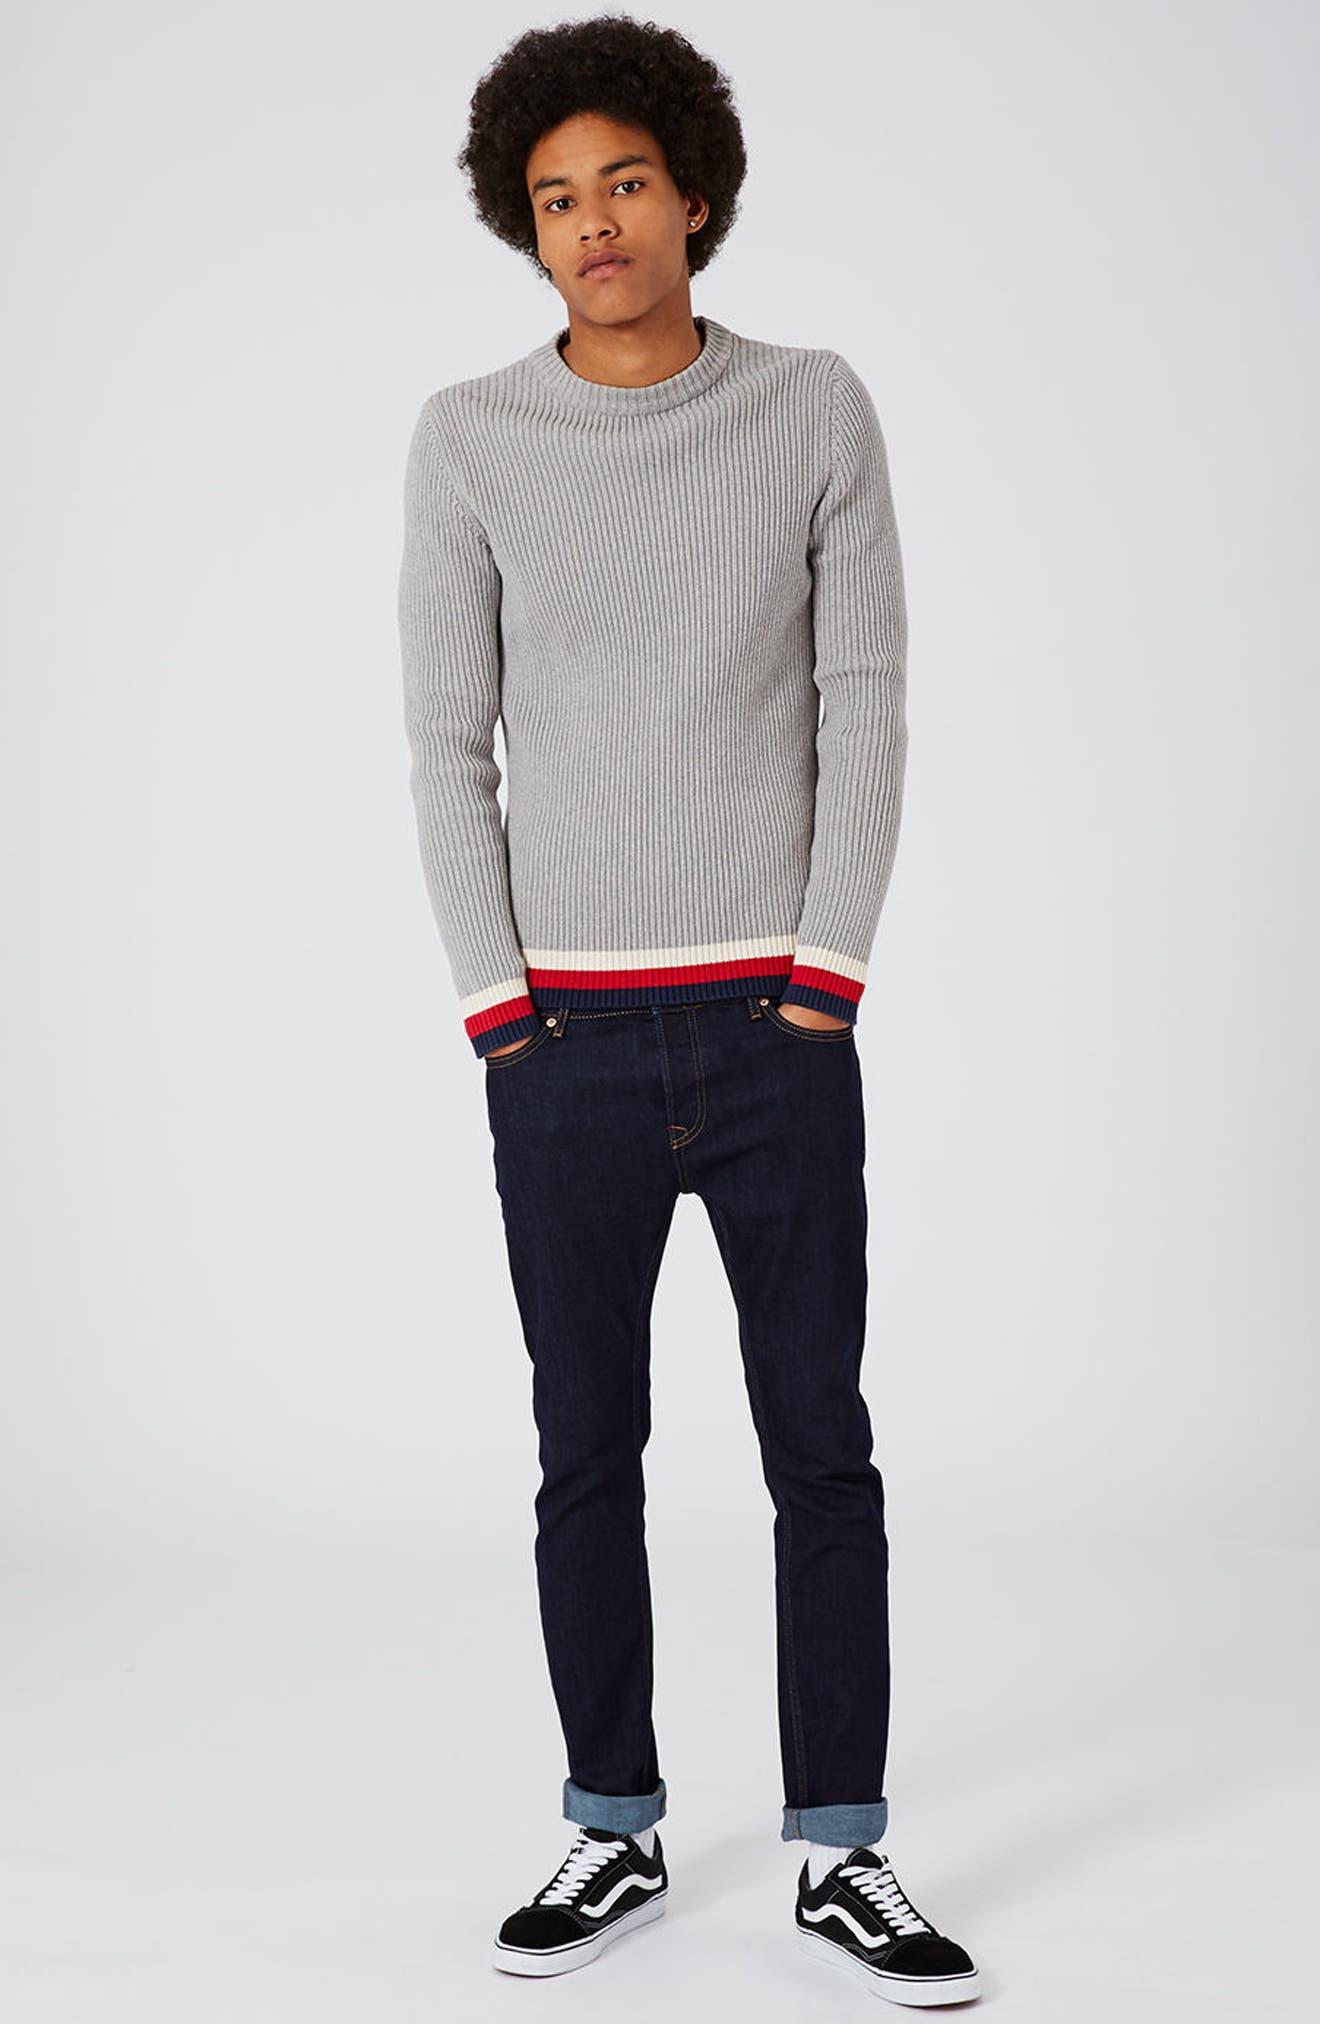 TOPMAN, Stretch Skinny Fit Raw Denim Jeans, Alternate thumbnail 7, color, BLUE